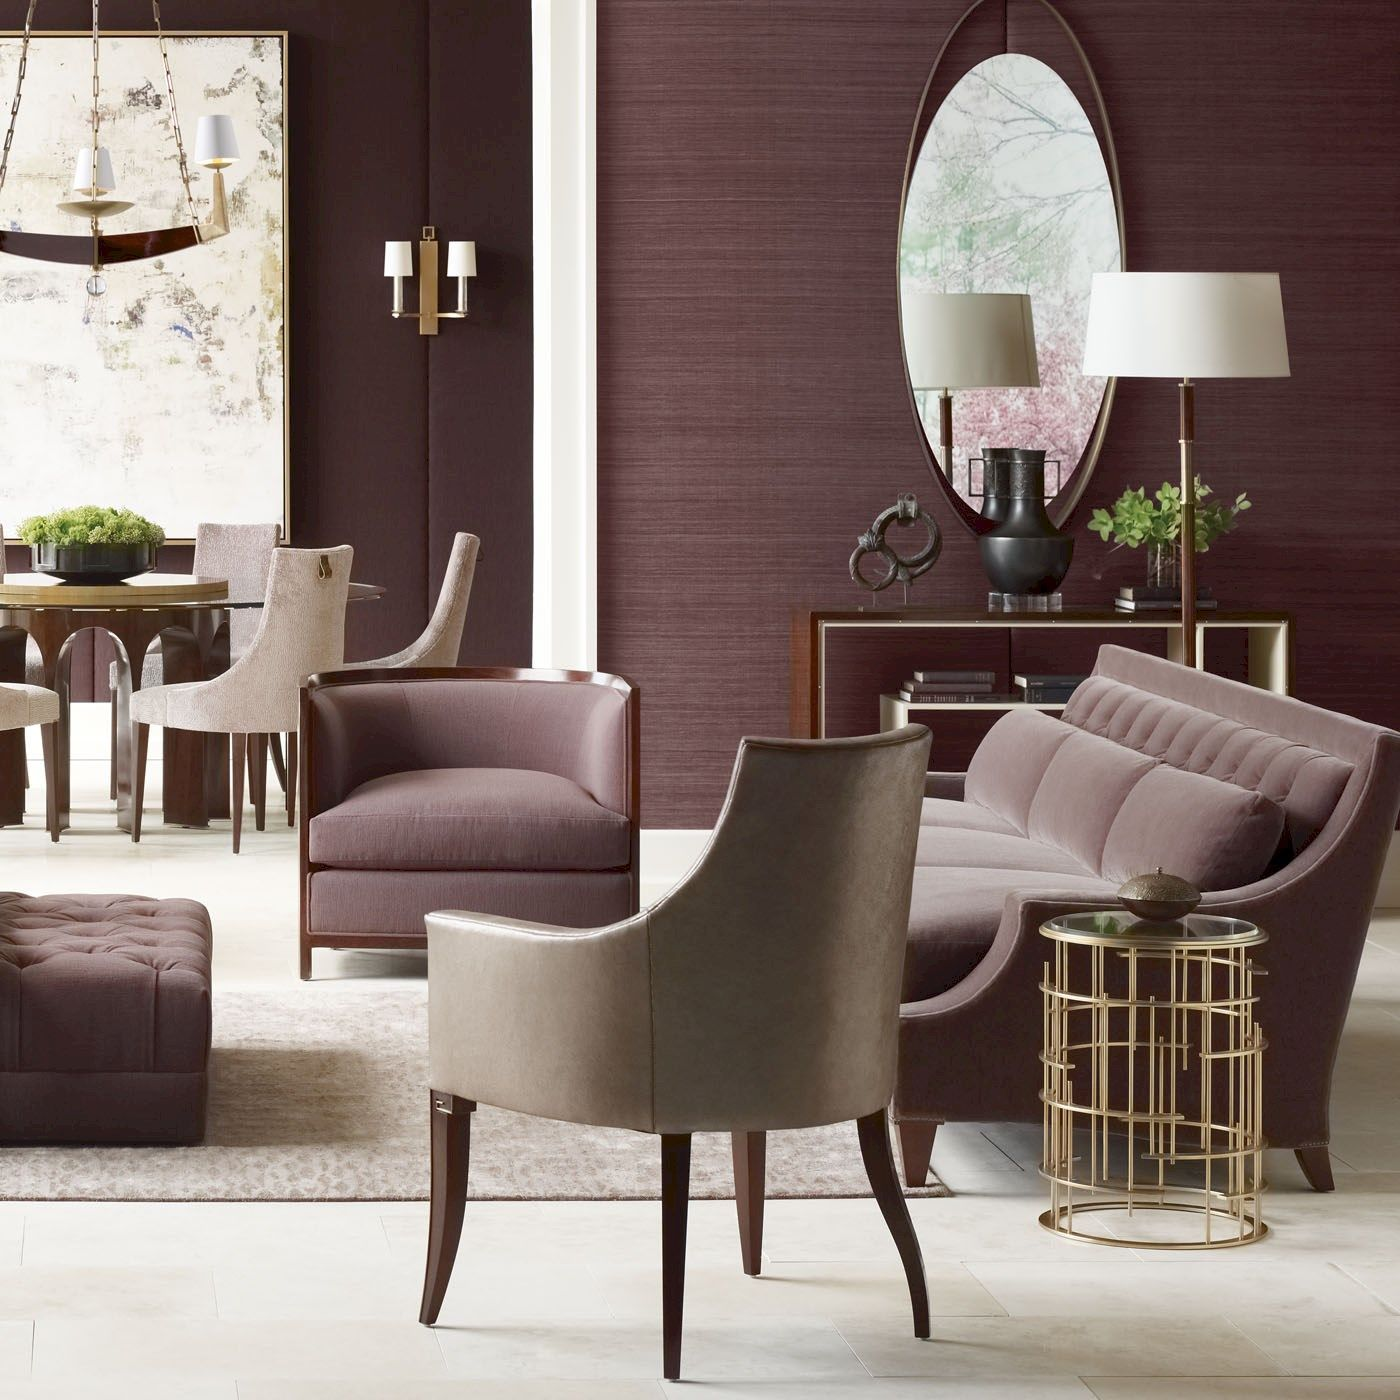 baker Furniture / Tufenkian Carpets - Tempo rug:  https://www.tufenkiancarpets